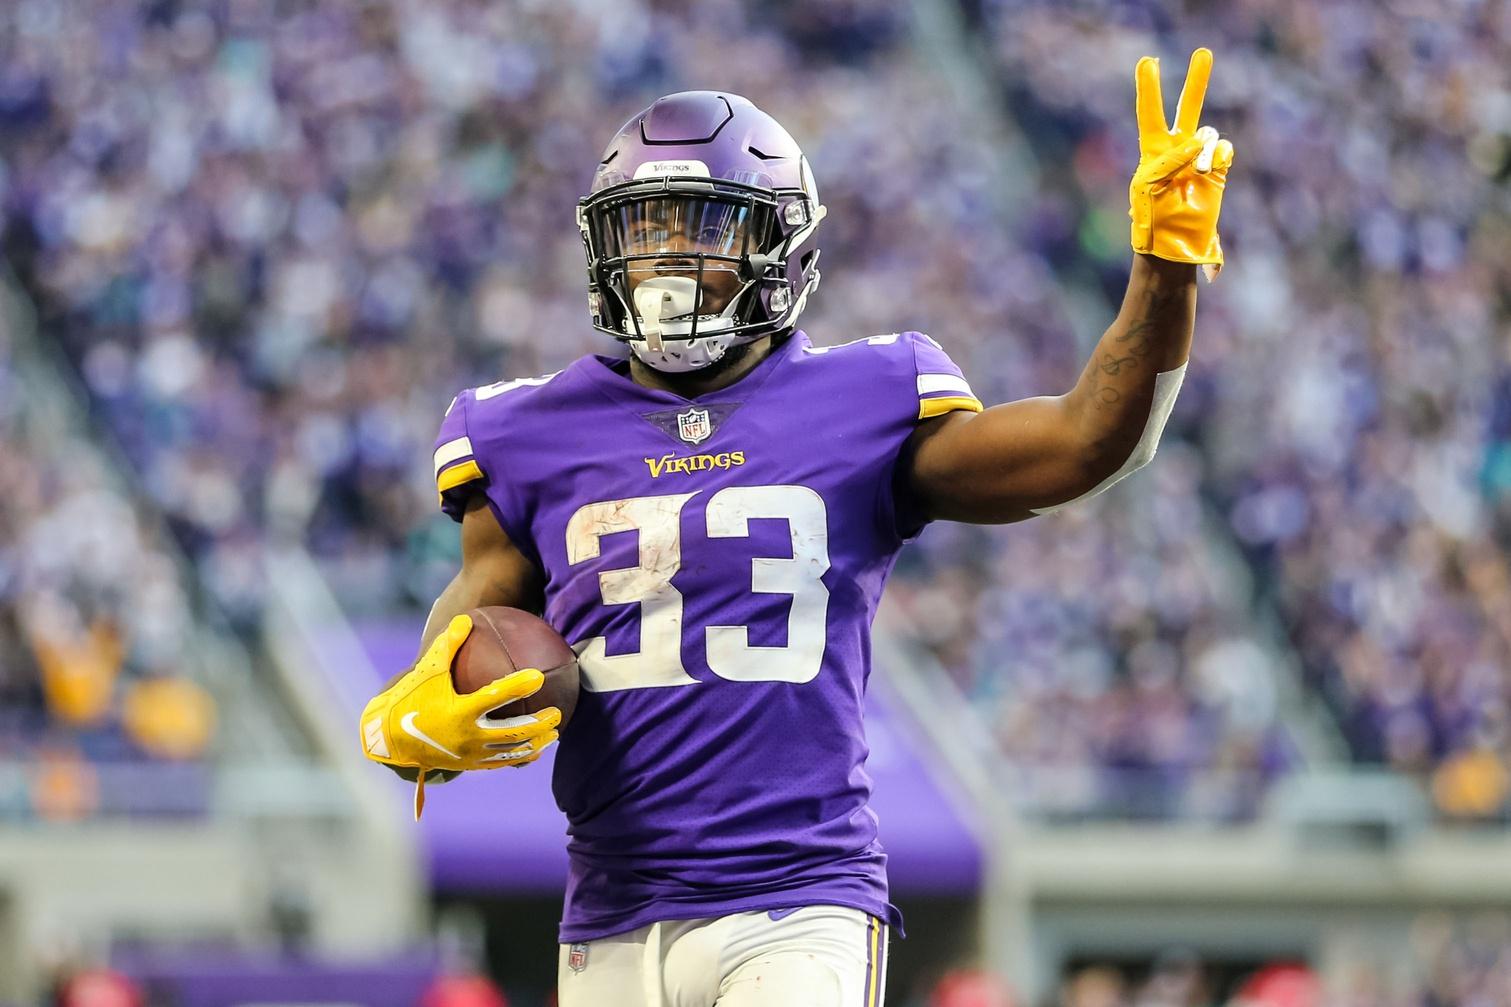 Refocused, NFL Week 15: Minnesota Vikings 41, Miami Dolphins 17